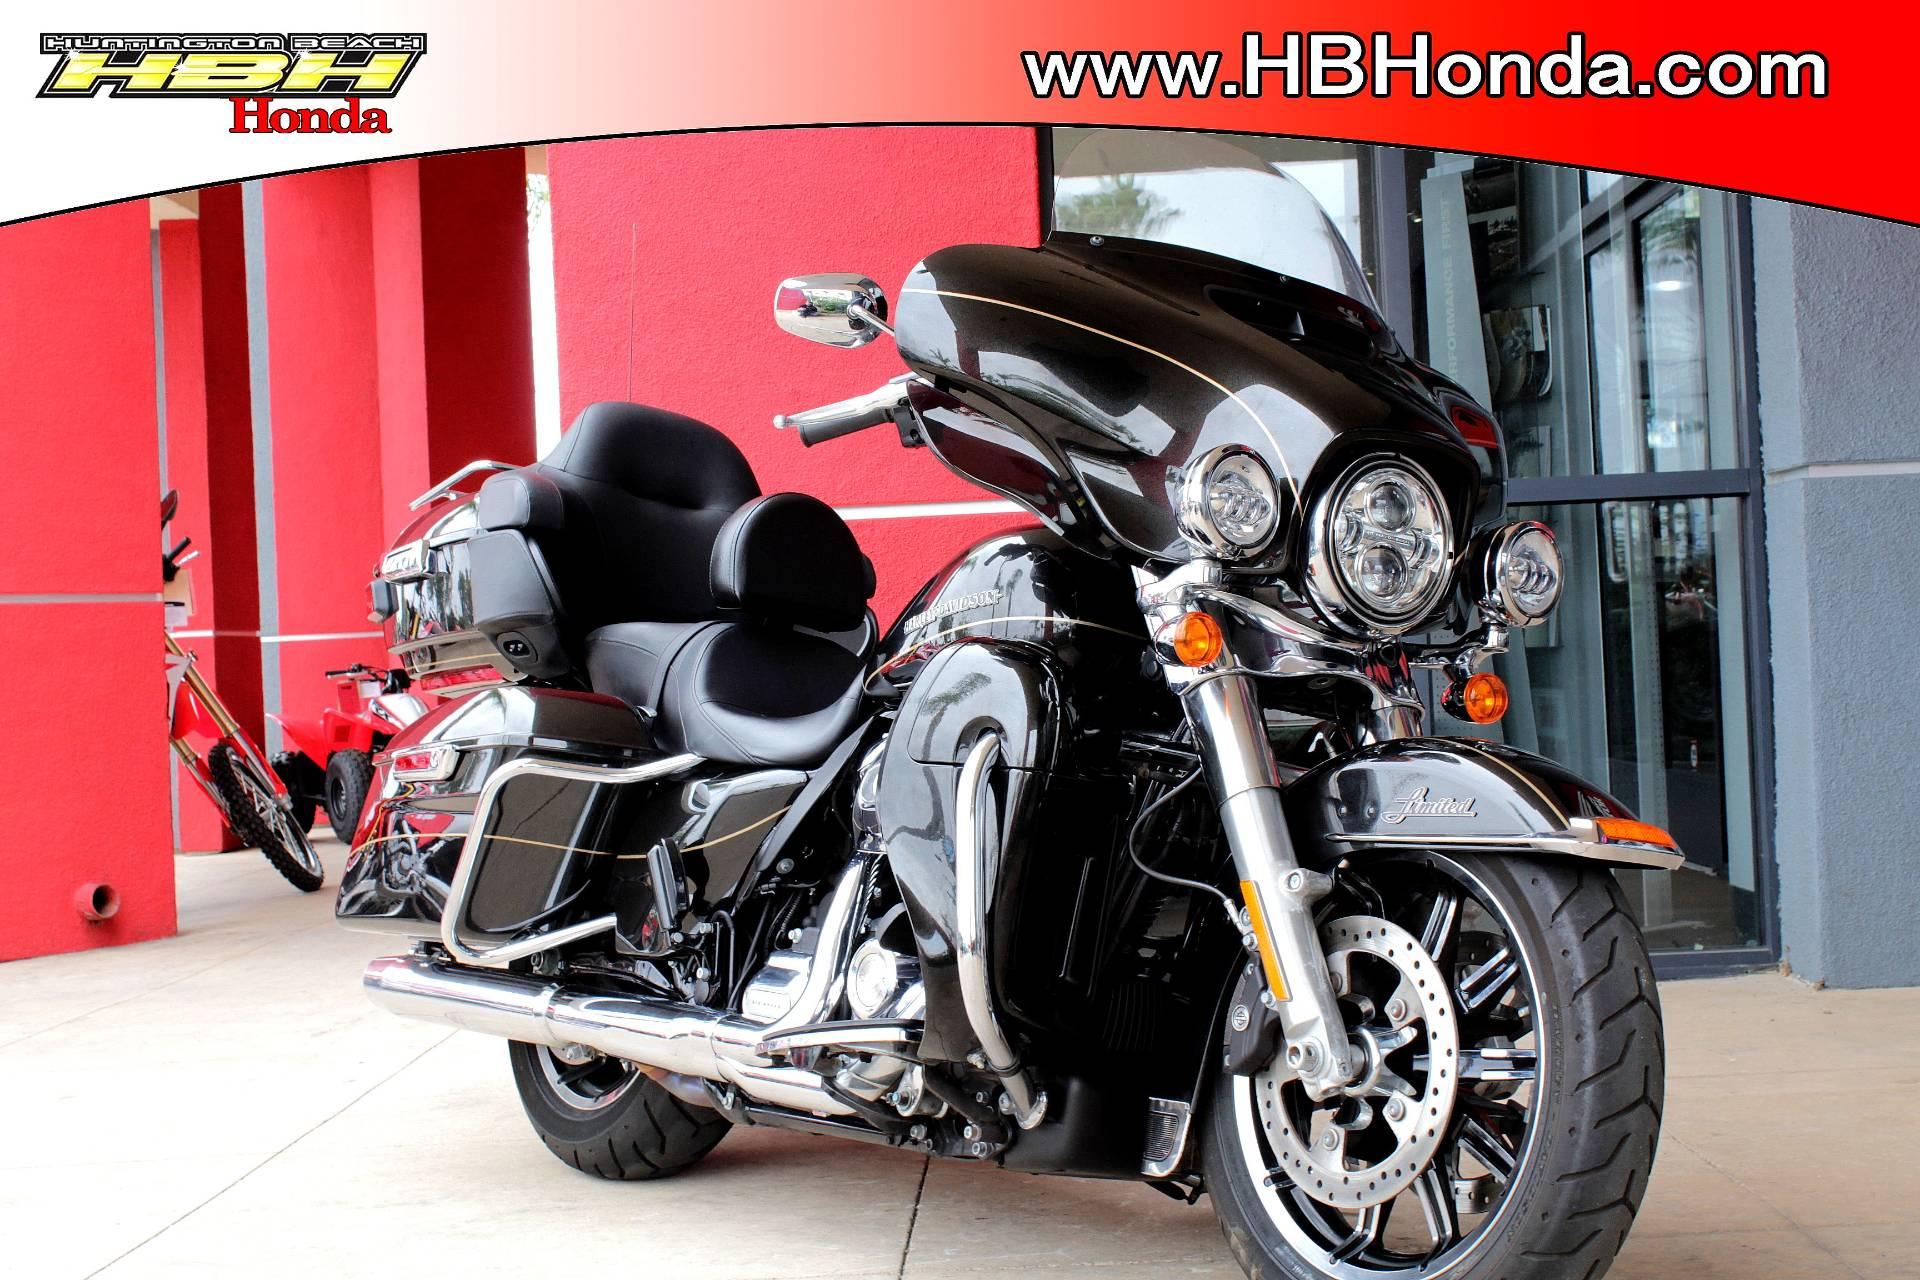 2017 Harley Davidson Ultra Limited Low In Huntington Beach California Photo 1